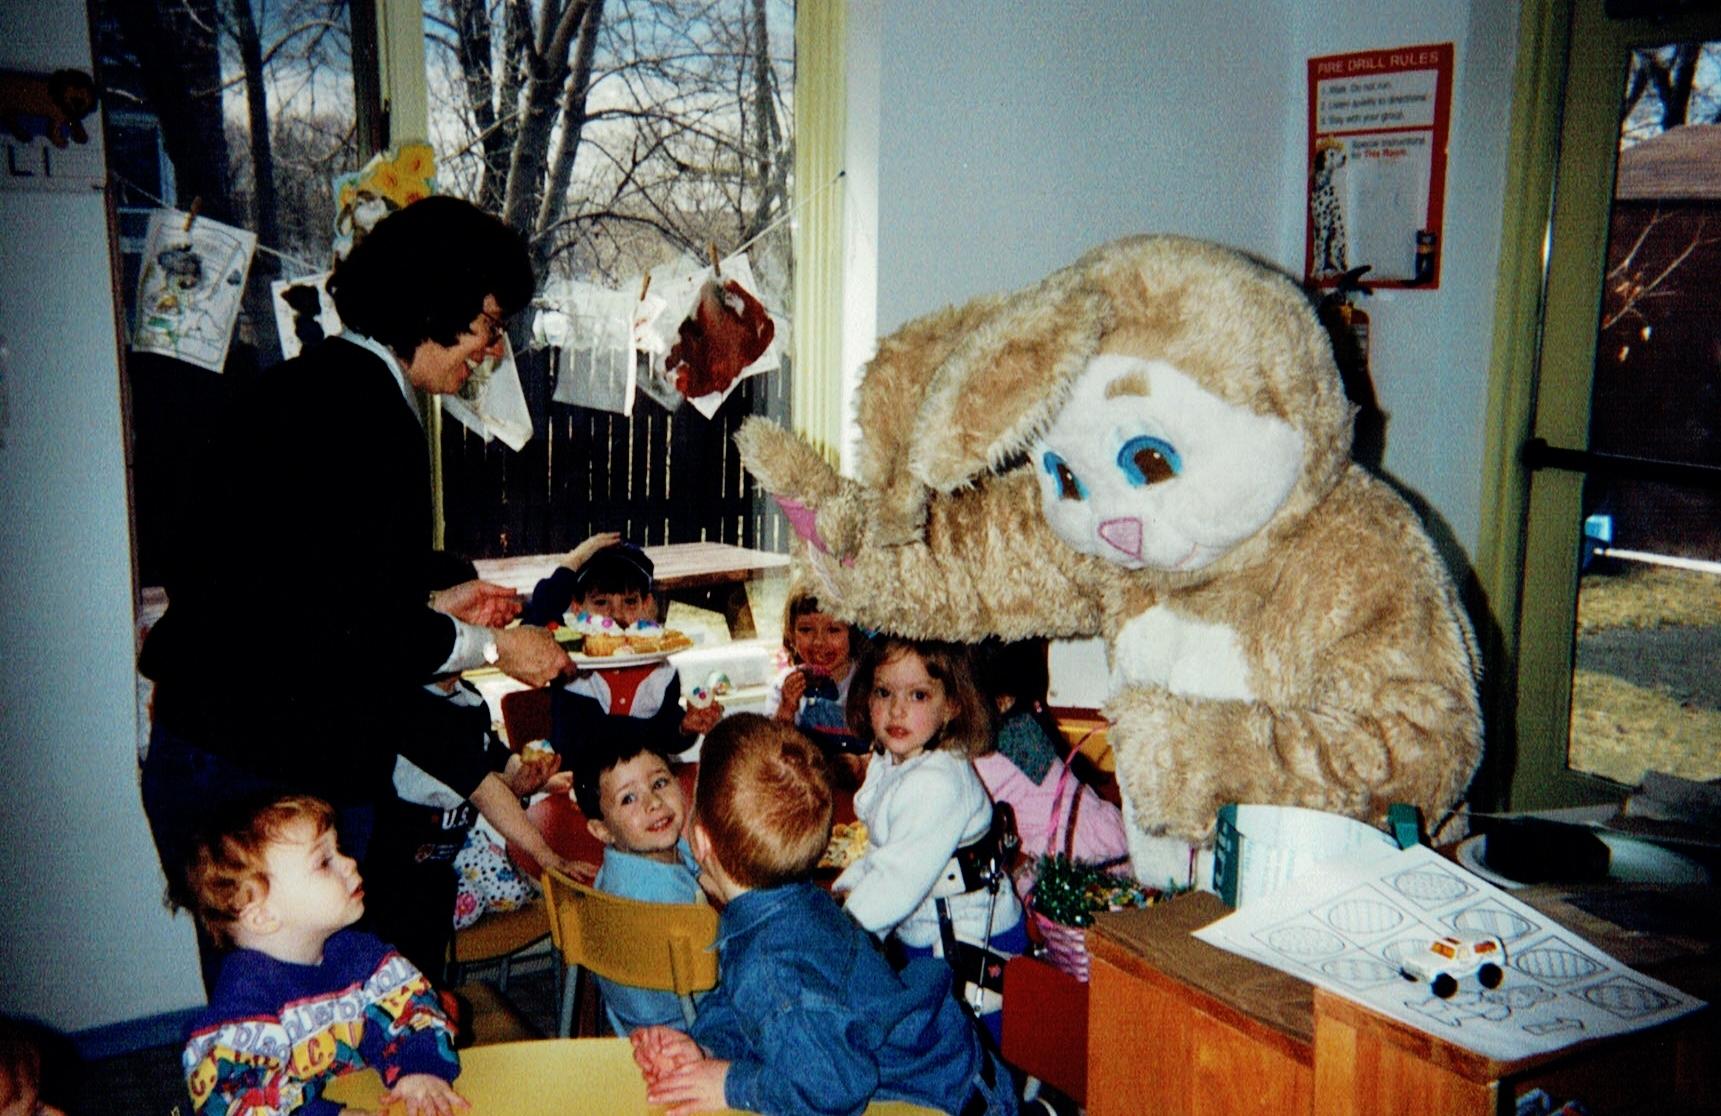 Easter bunny at nursery School.jpg